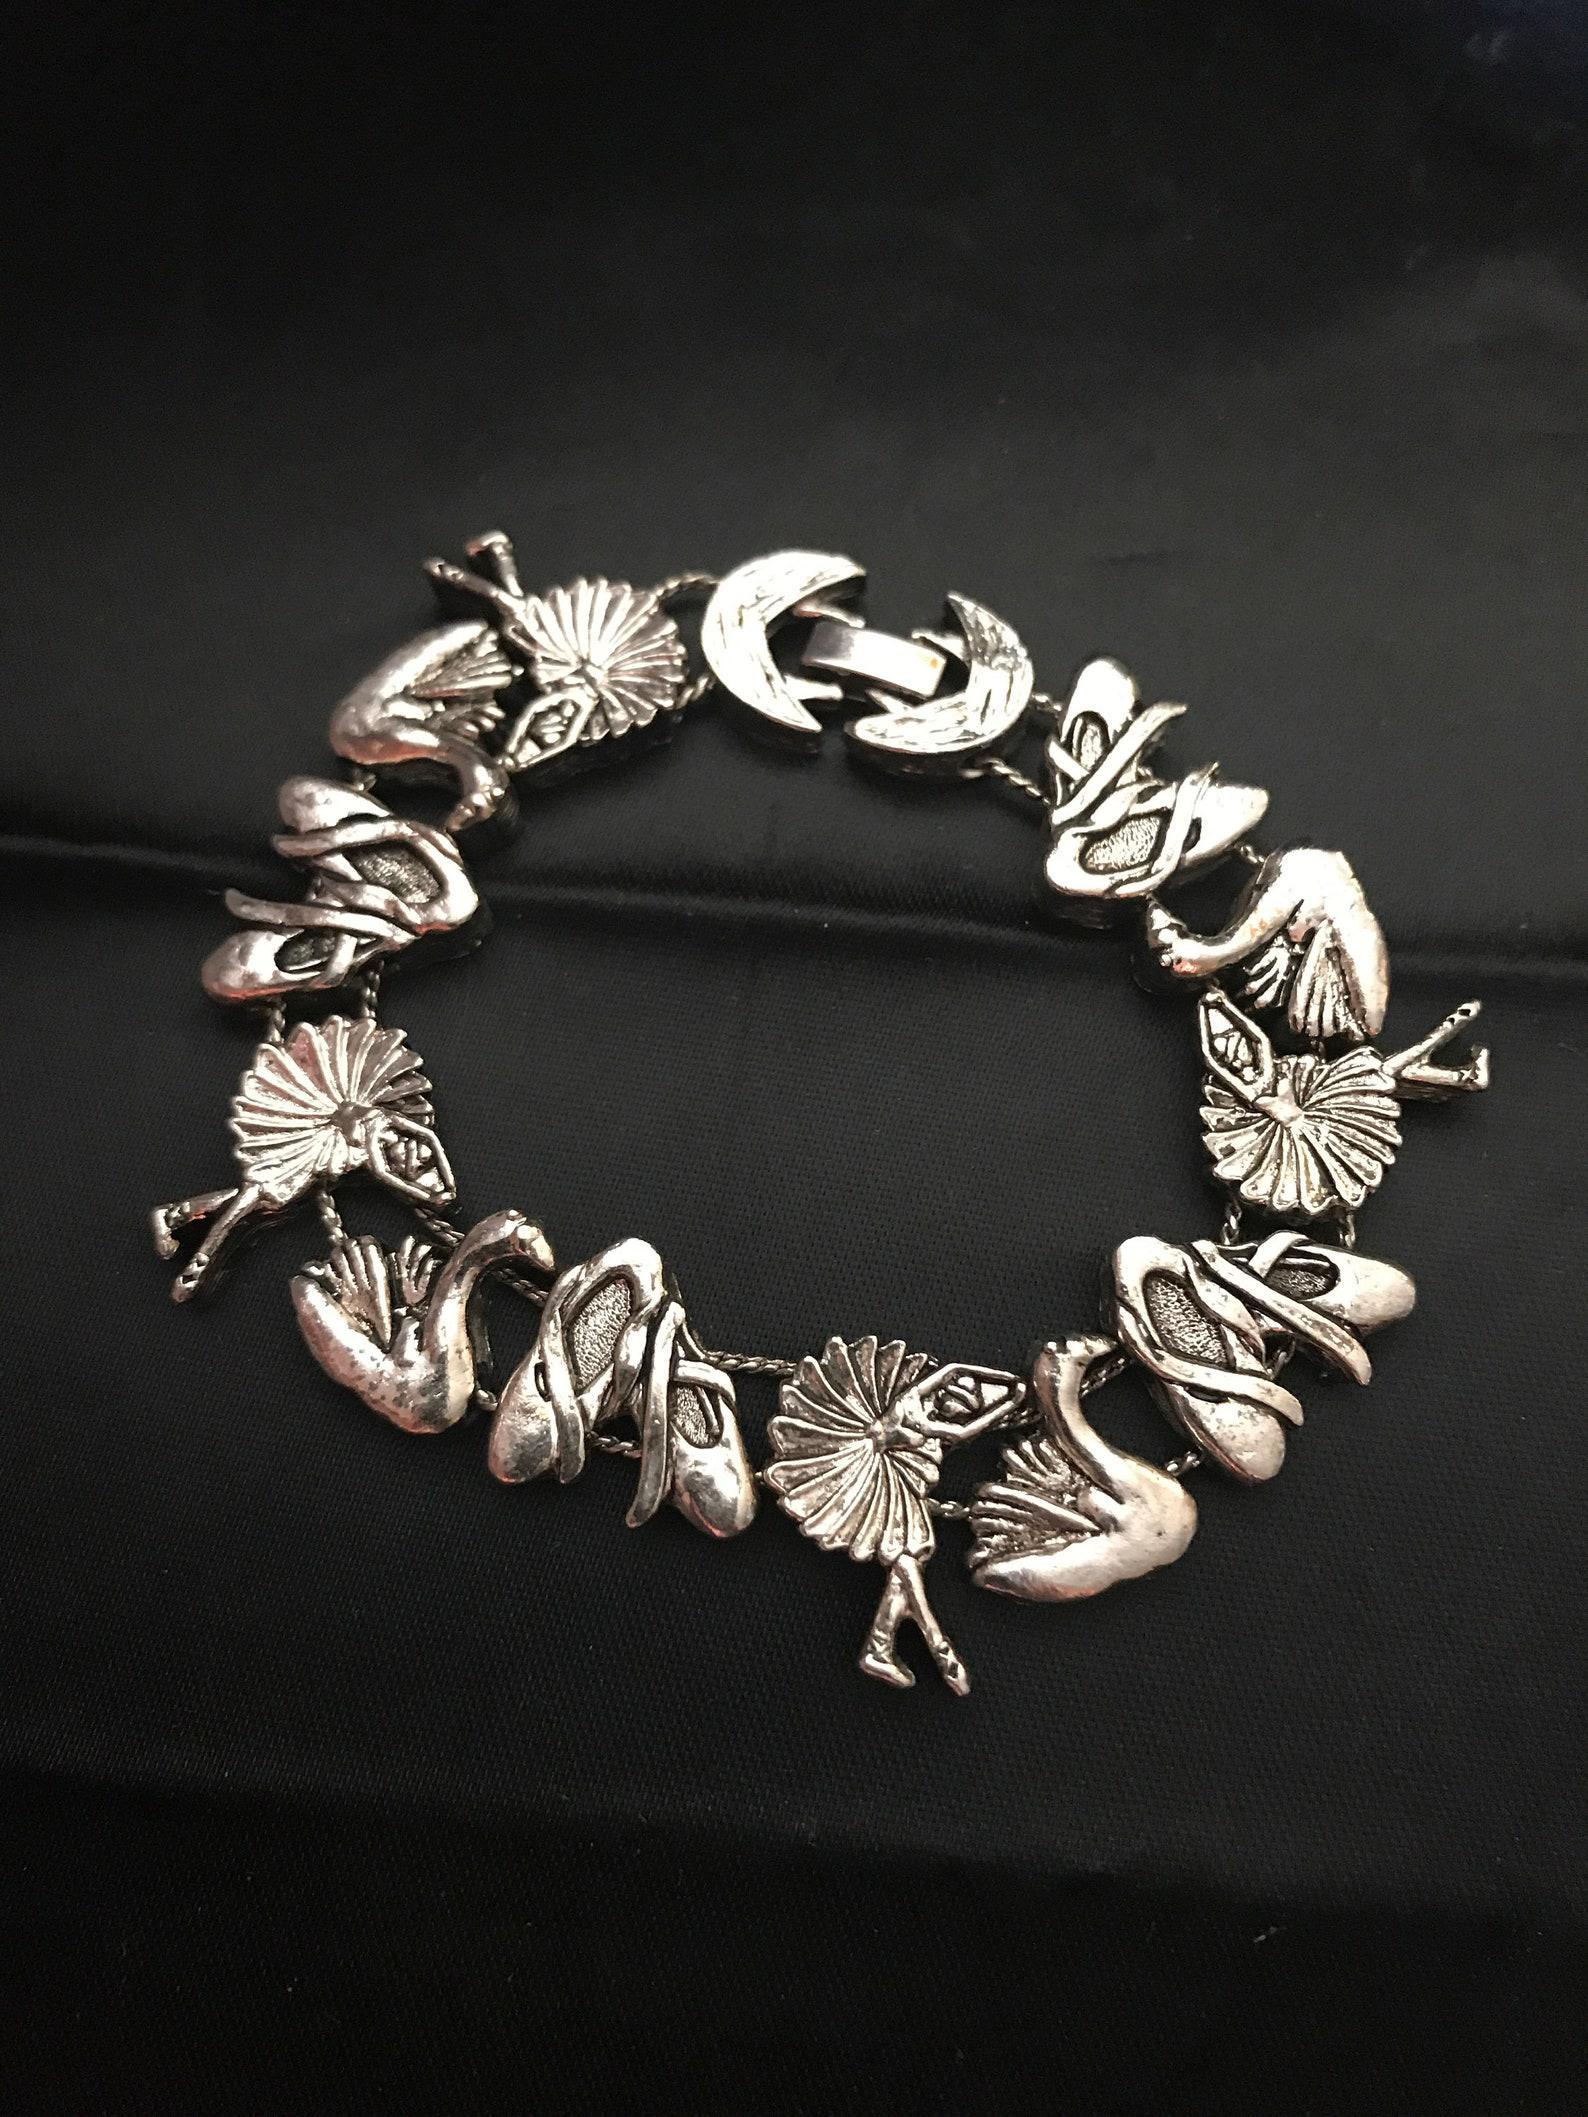 vintage swan lake ballerina charm slide bracelet-ballet sean lake theme bracelet